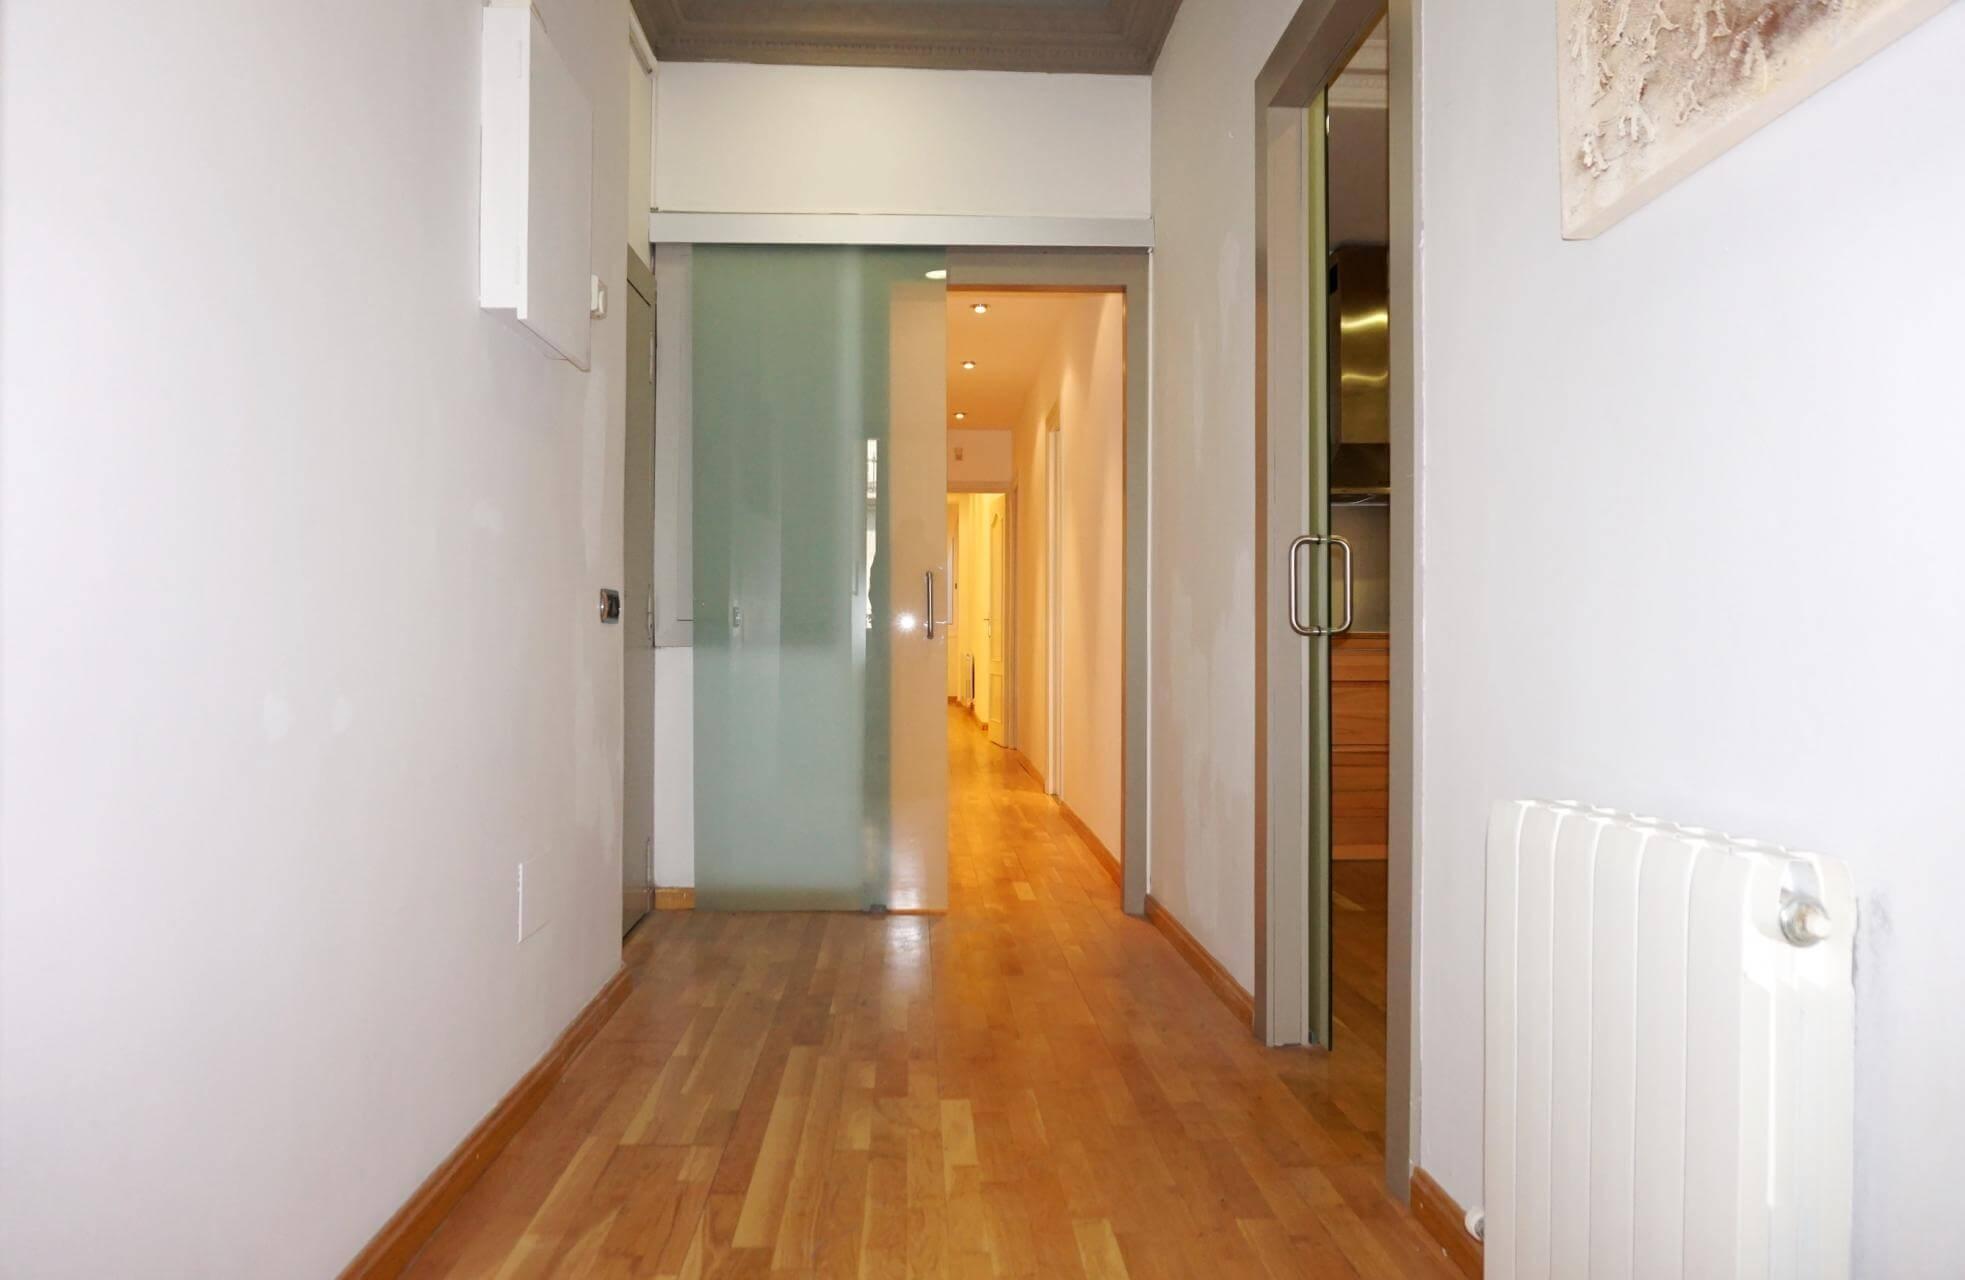 Piso en alquiler barcelona l 39 eixample rossell rambla catalunya - Alquiler pisos barcelona eixample ...